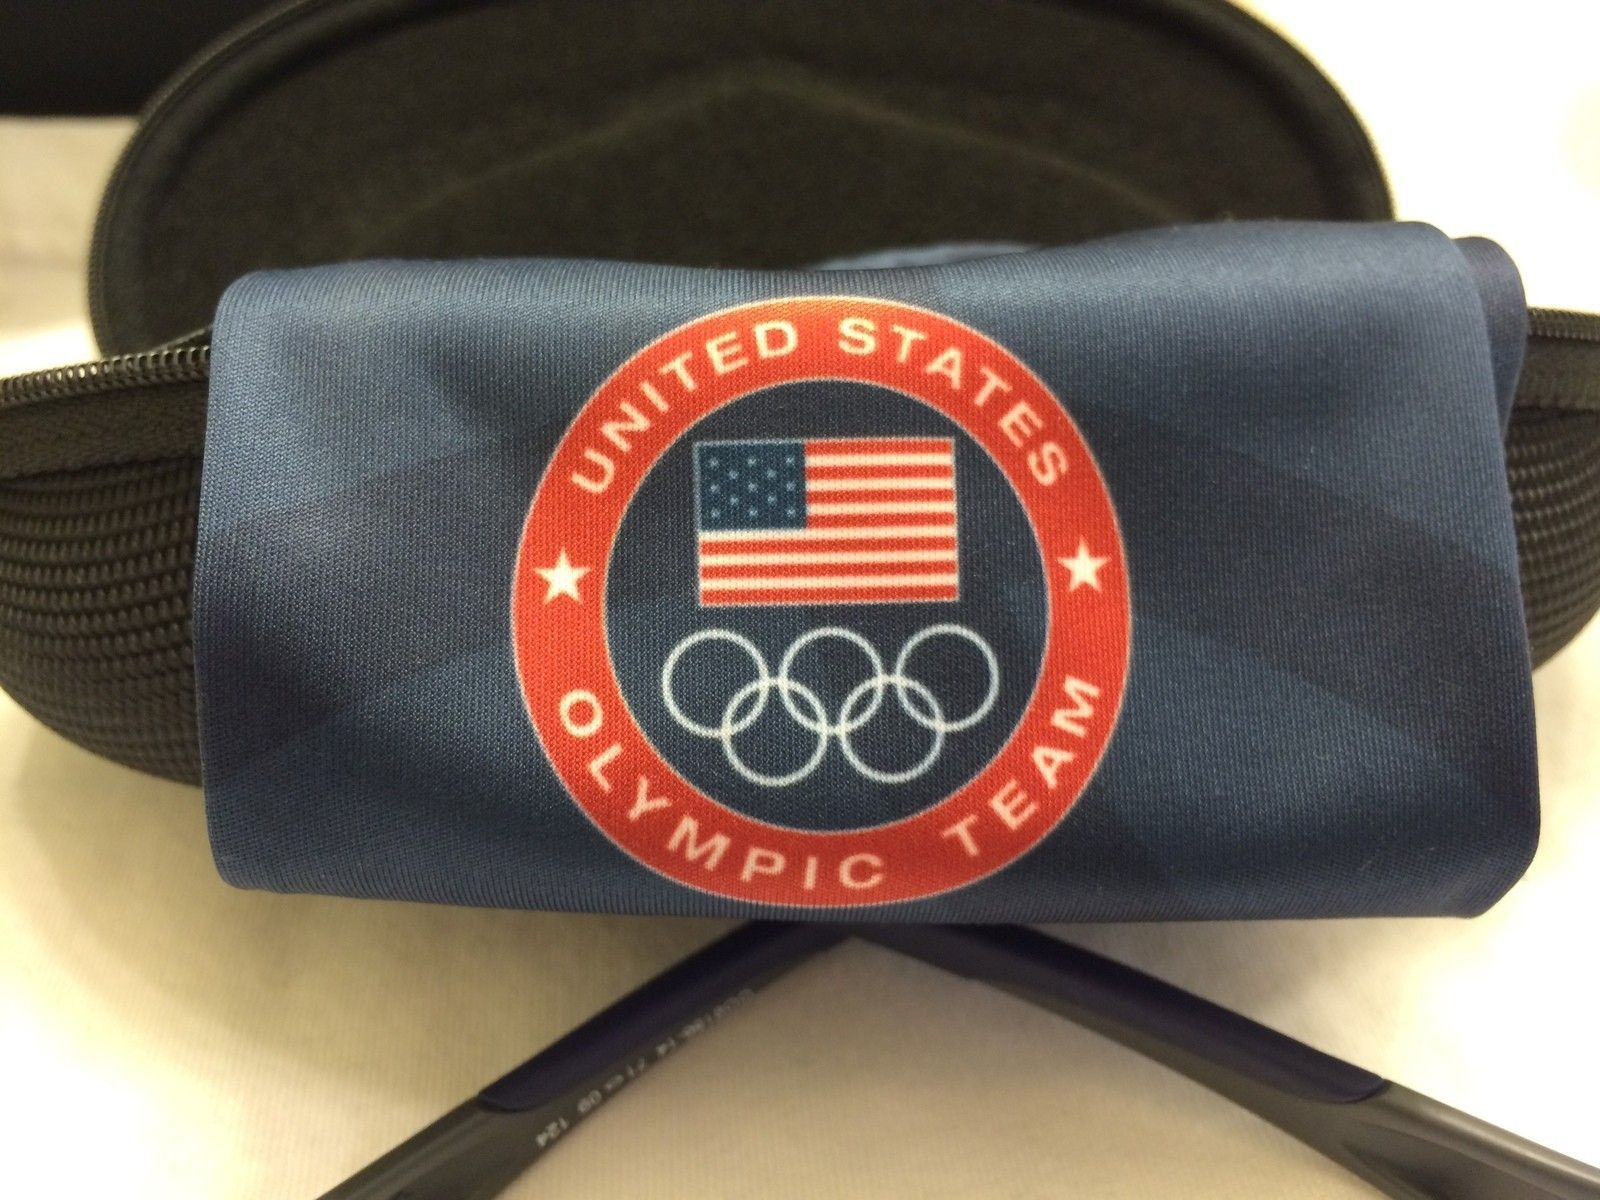 2 Fast Jackets - Olympic - under $89 - 2015-04-08 17.54.58.jpg